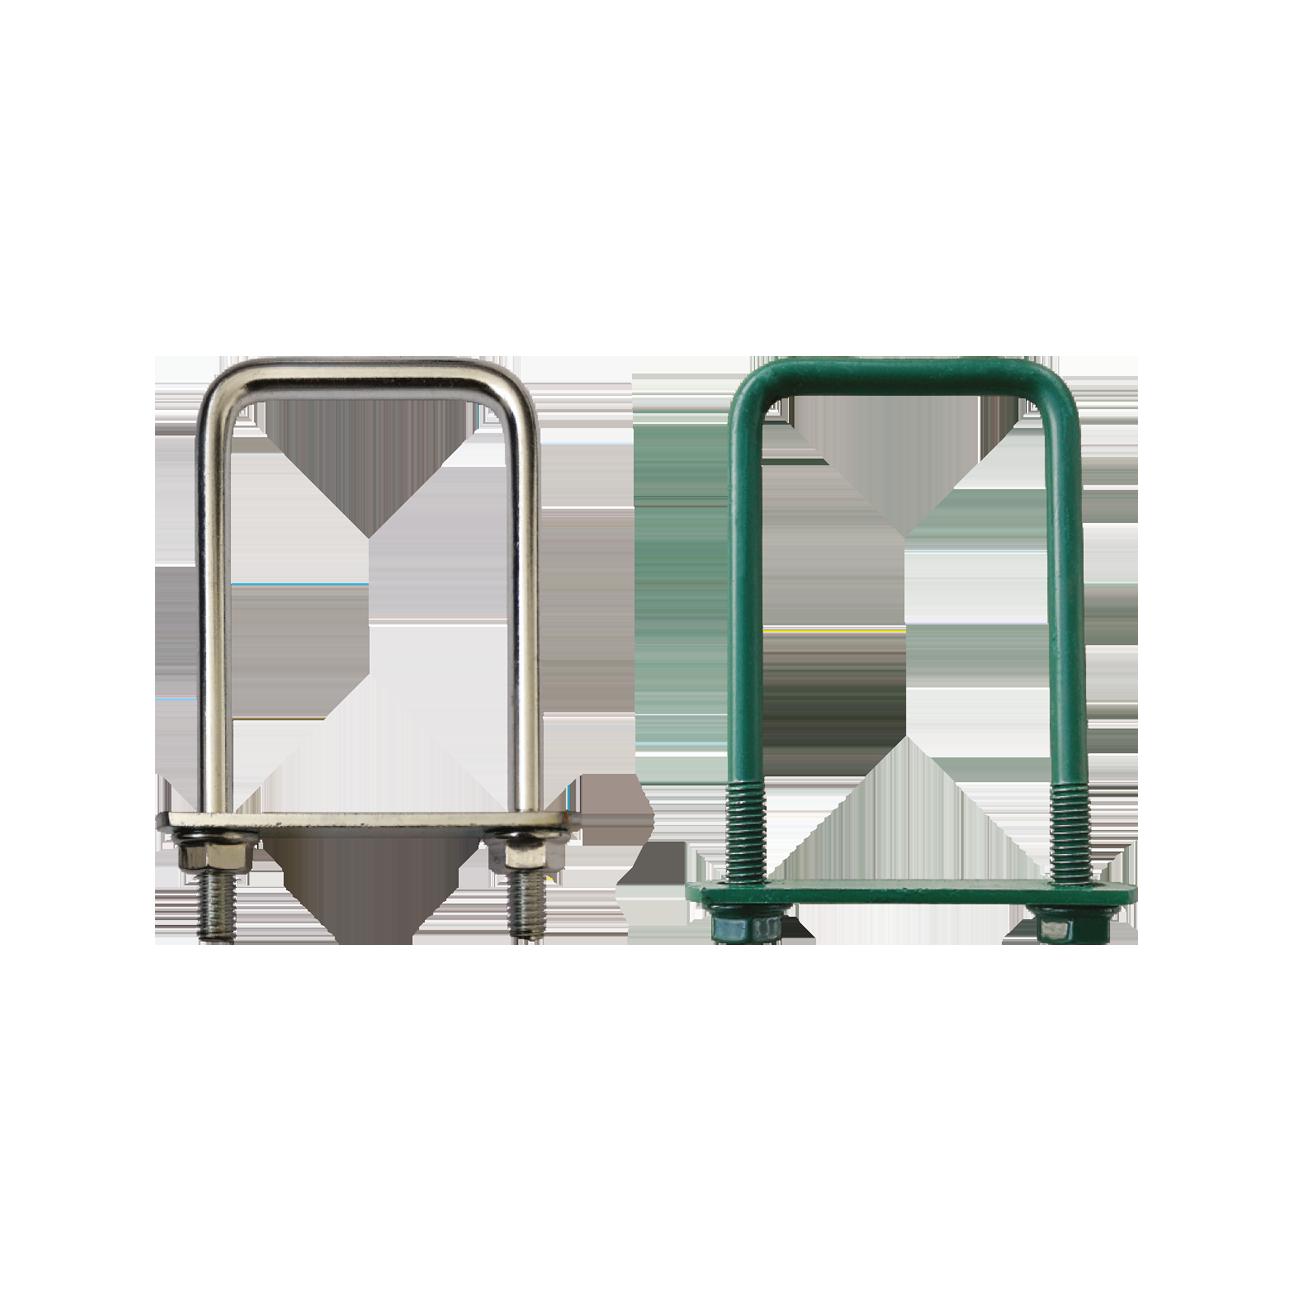 Brida Otel Rotund Model Bg Pentru Fixarea Panourilor De Gard Pe Stalpi Rectangulari Lxb 30×30 Mm Acoperire Zincat Electrolitic